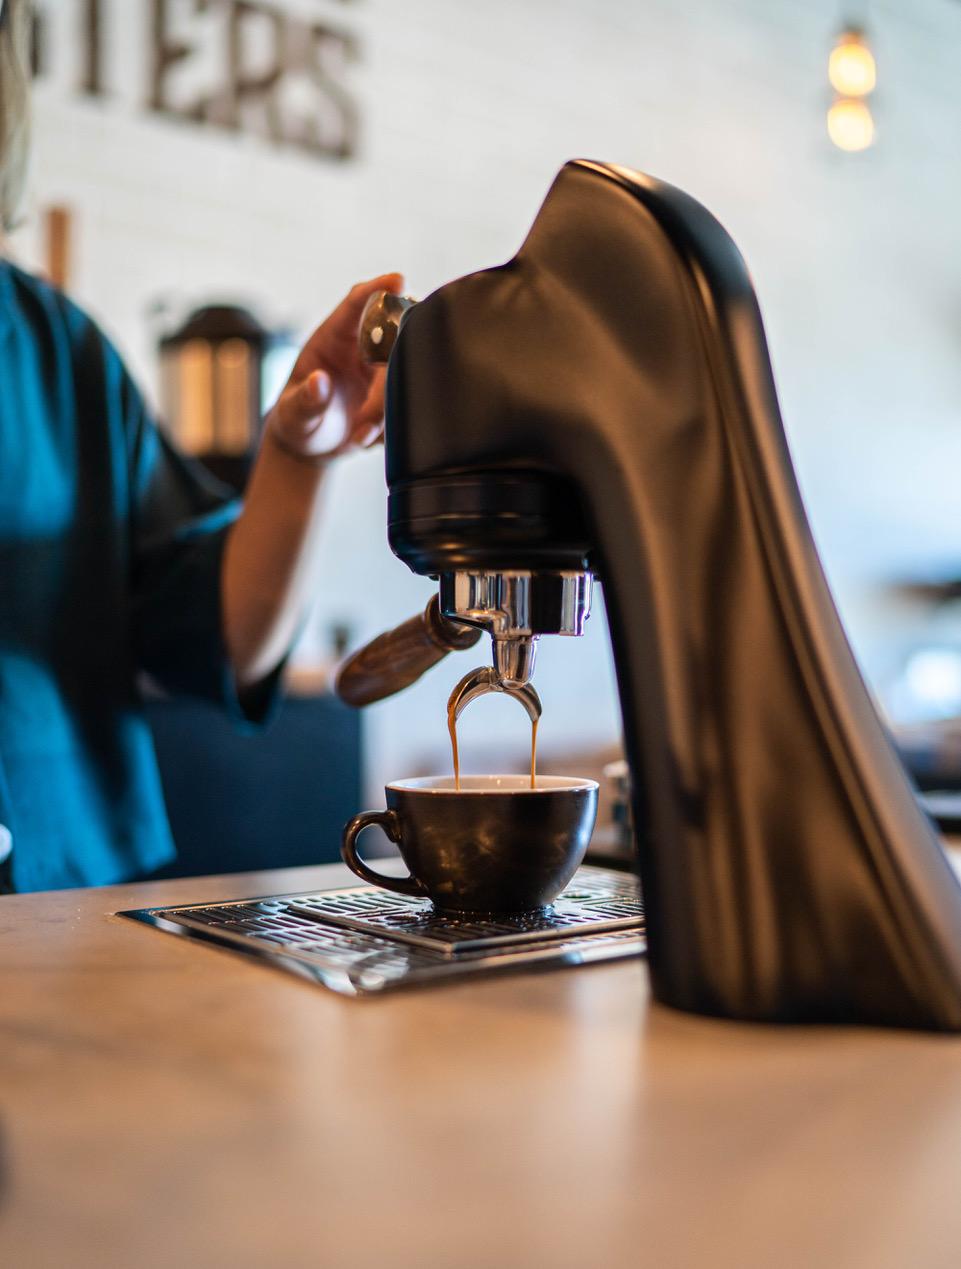 Dark Moon Coffee espresso